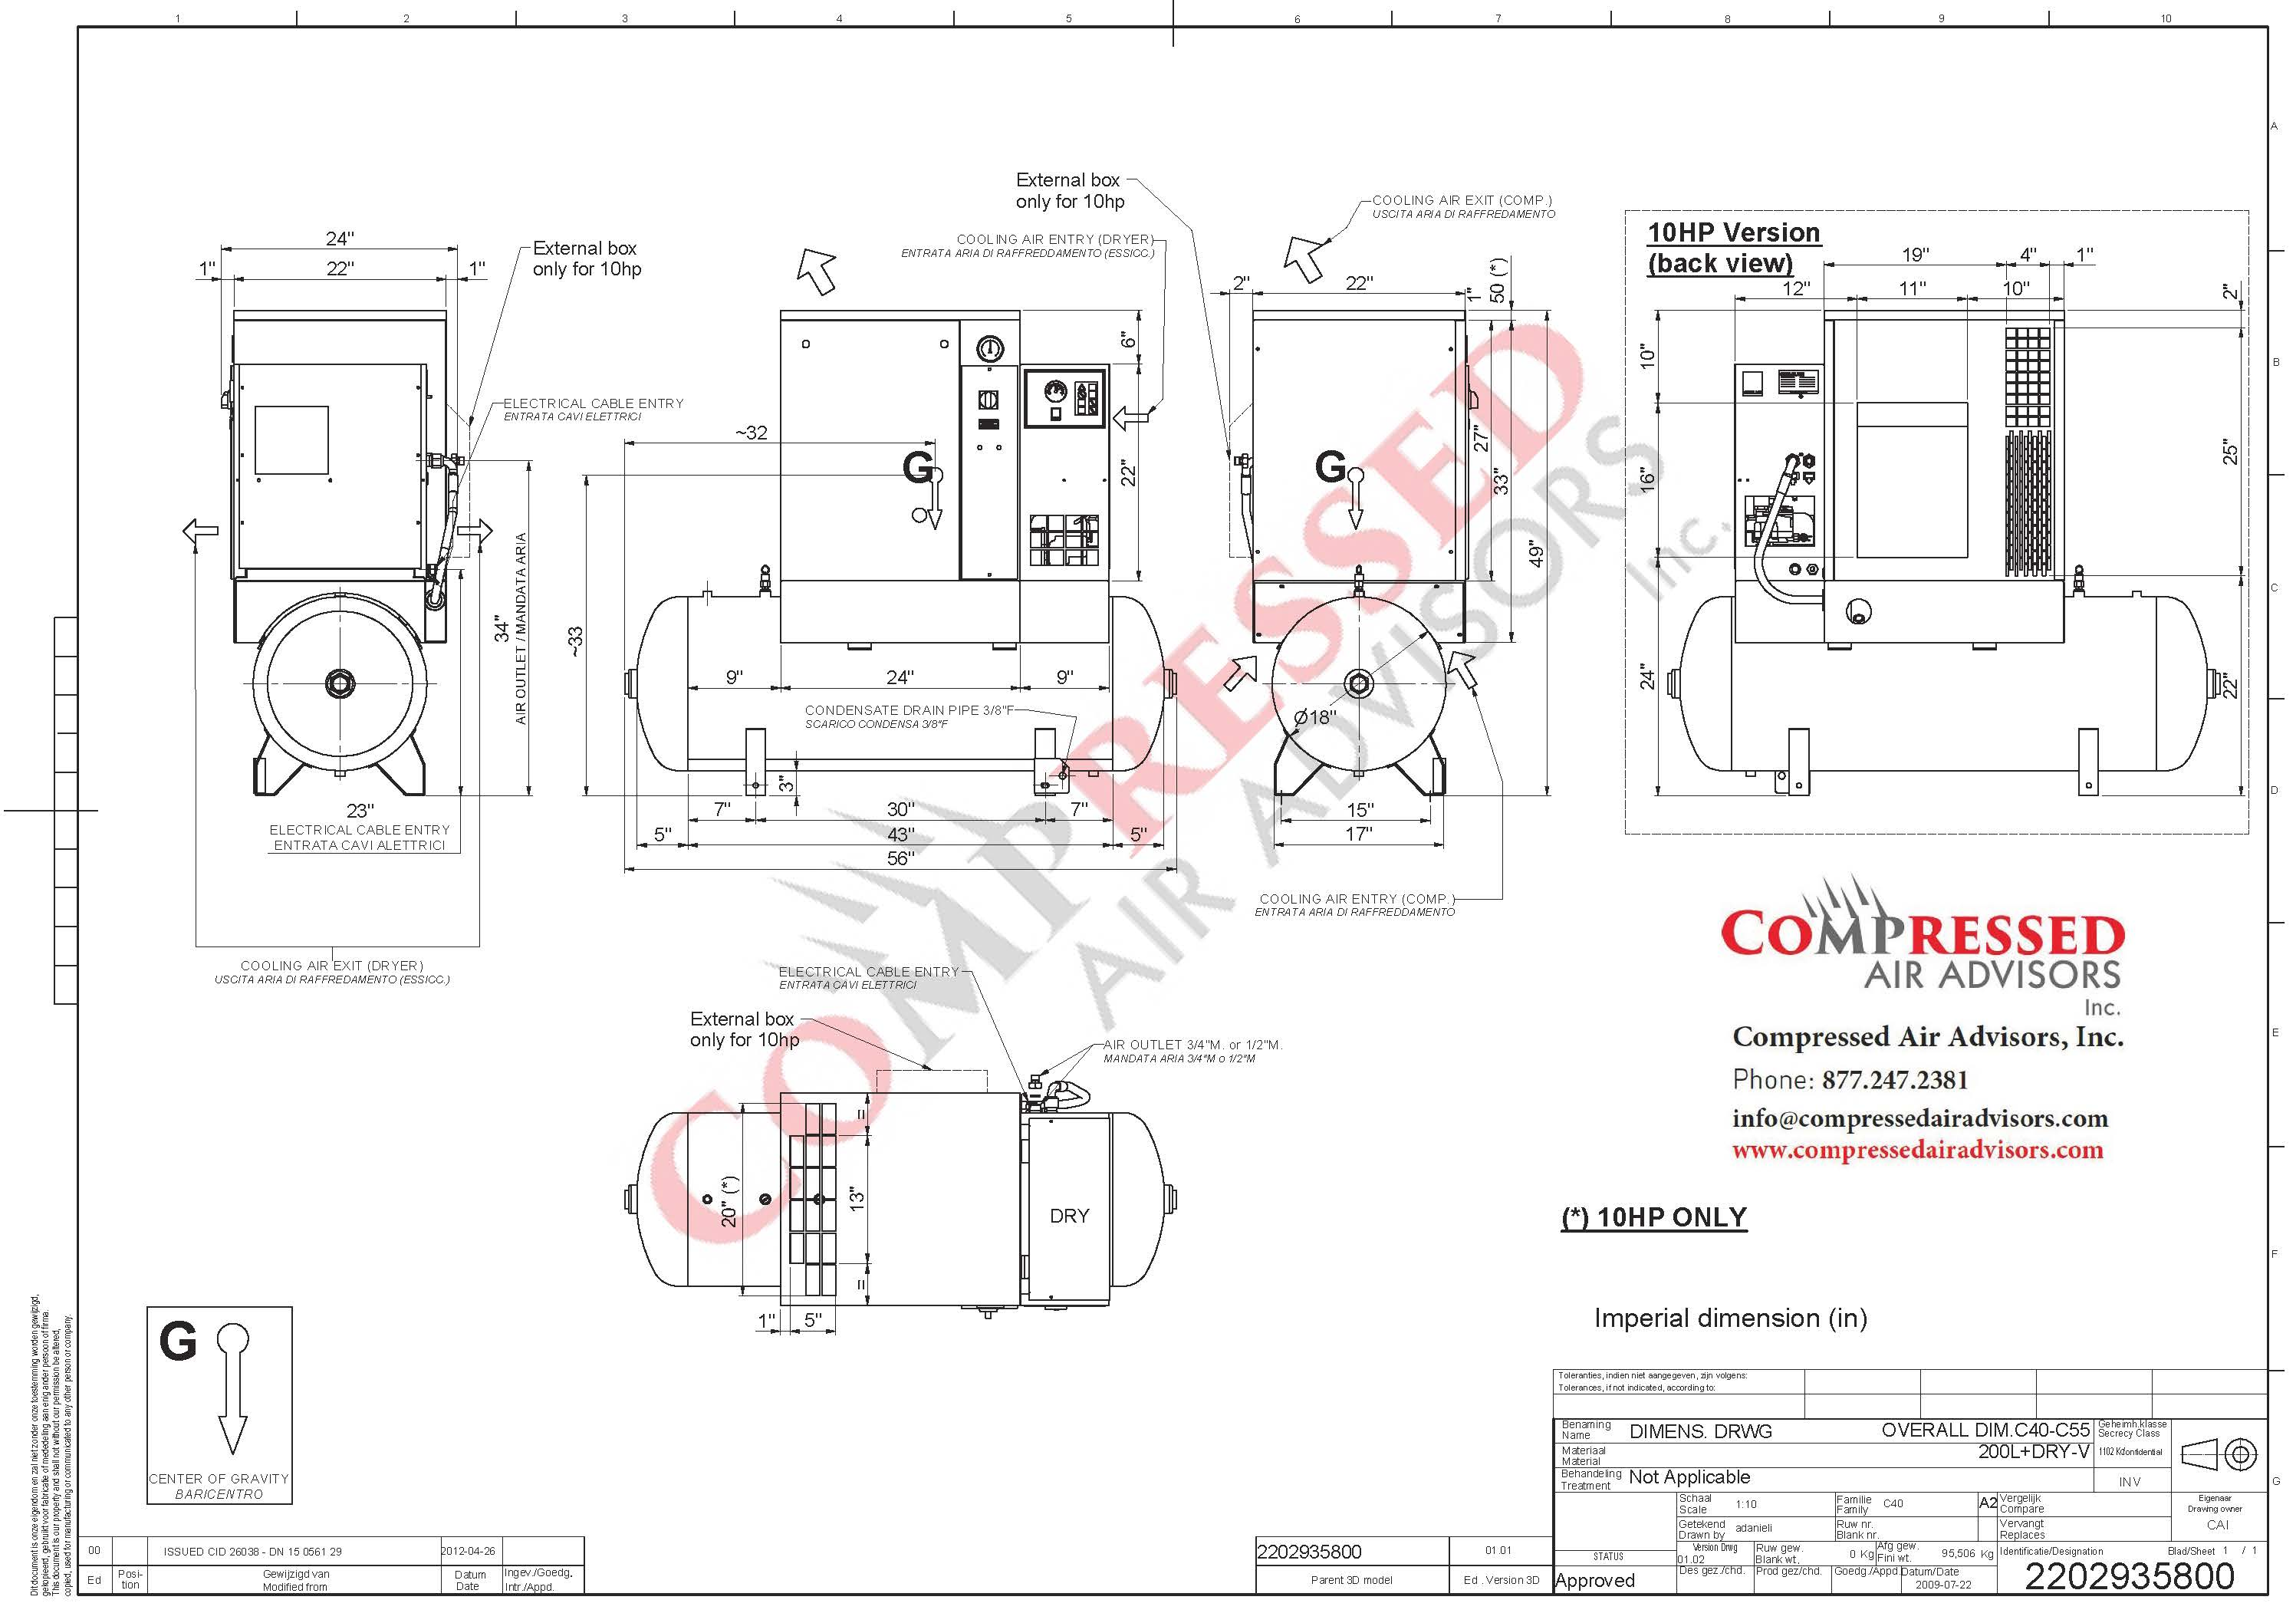 ZF_9957] Chicago Wiring Diagram Free DiagramEumqu Embo Vish Ungo Sapebe Mohammedshrine Librar Wiring 101